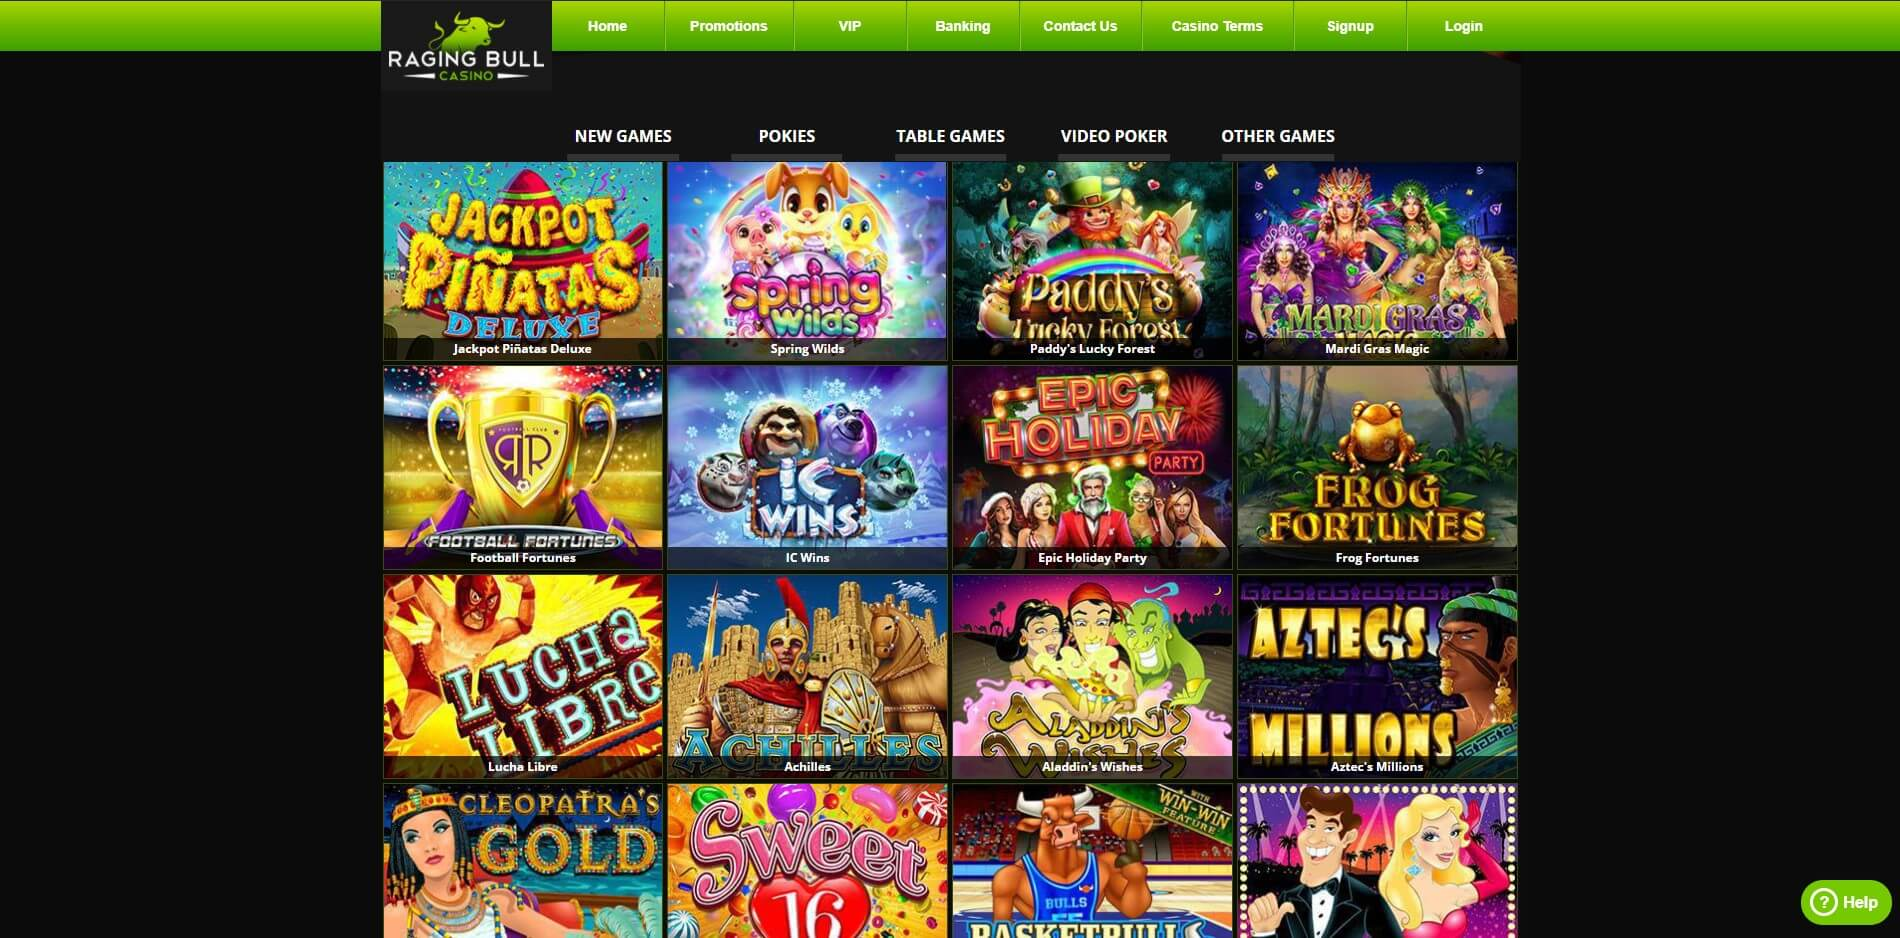 Raging Bull Casino Games Screenshot